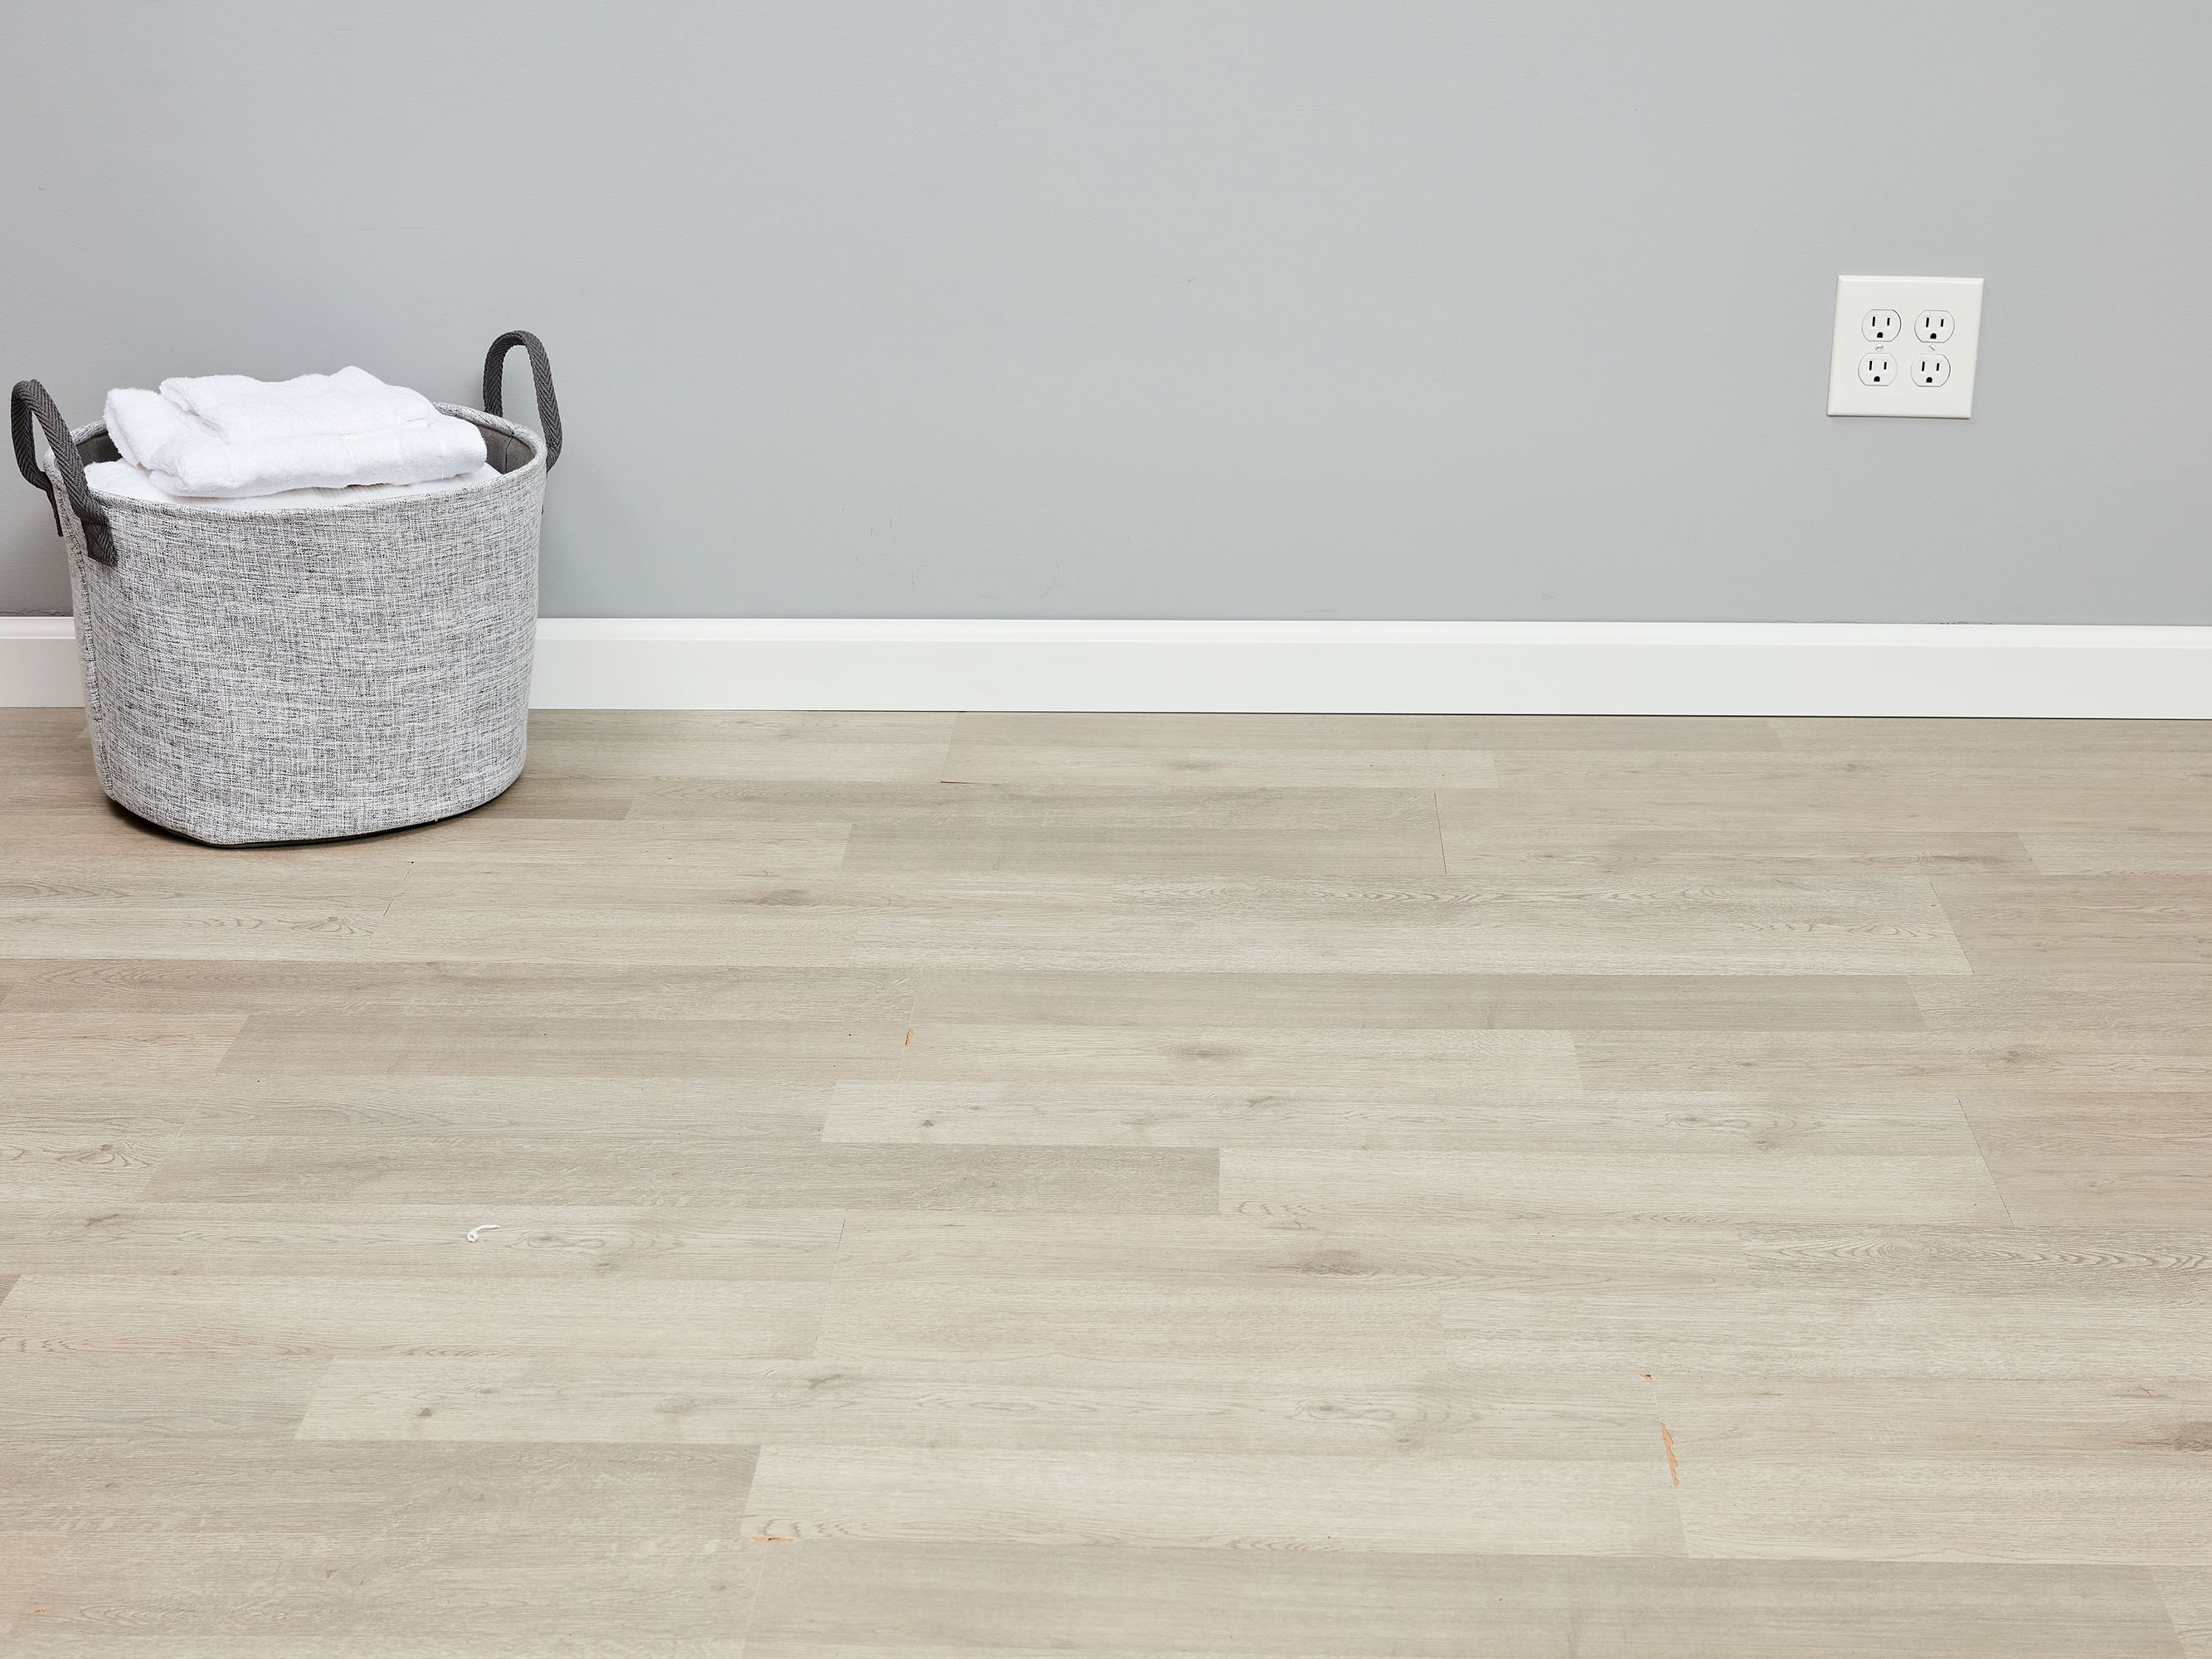 How To Install Laminate Flooring, Main Gate Laminate Flooring